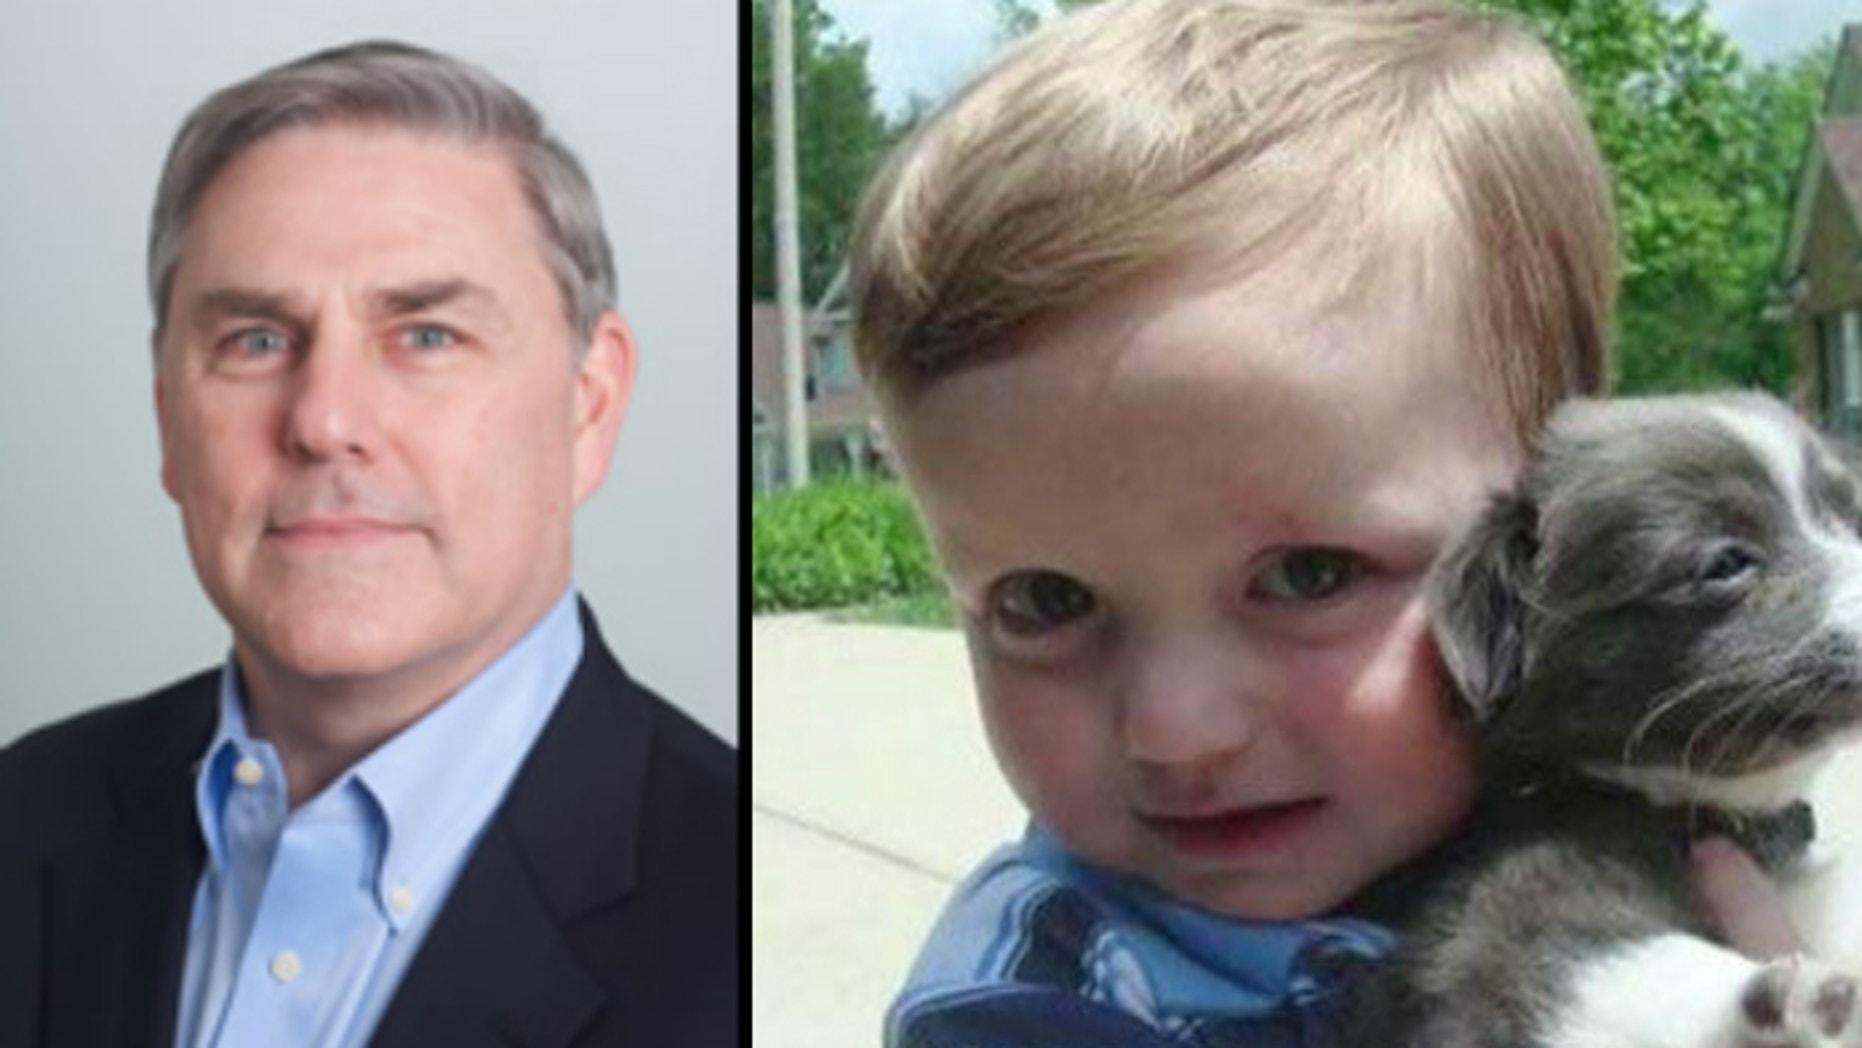 Chimerix CEO Kenneth Moch (L) and 7-year-old Josh Hardy (R)